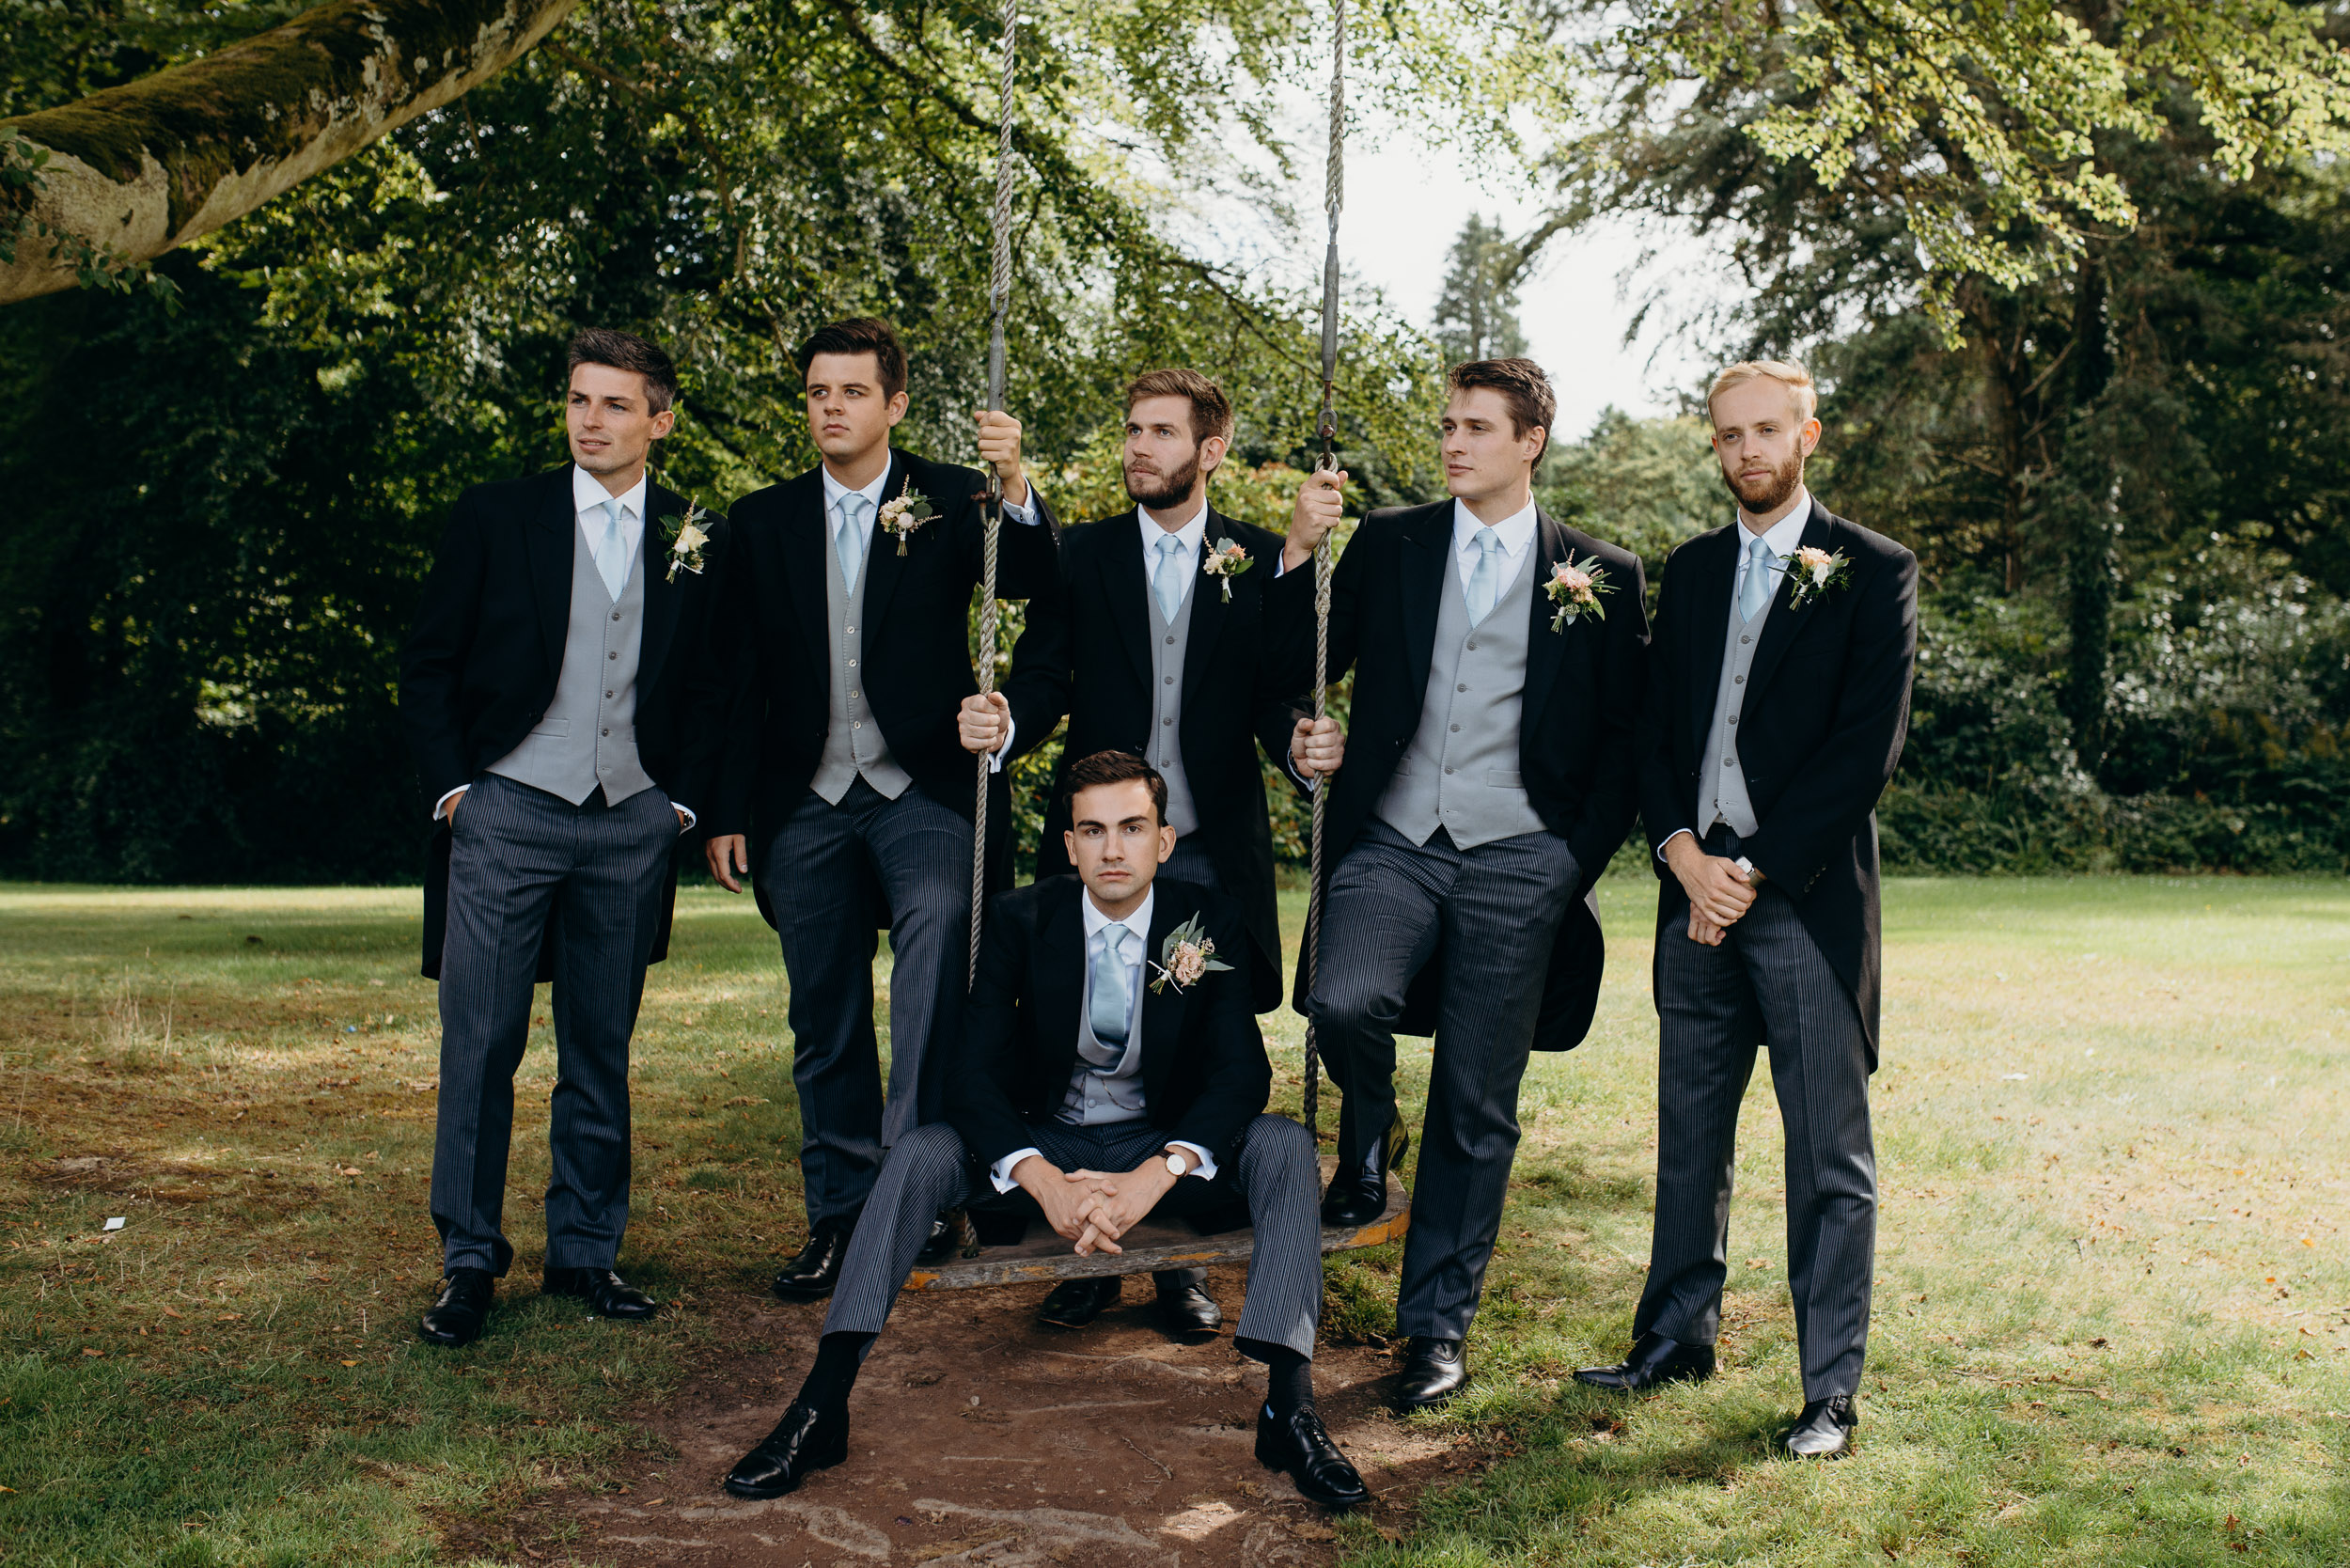 drenagh estate wedding photography-69.jpg